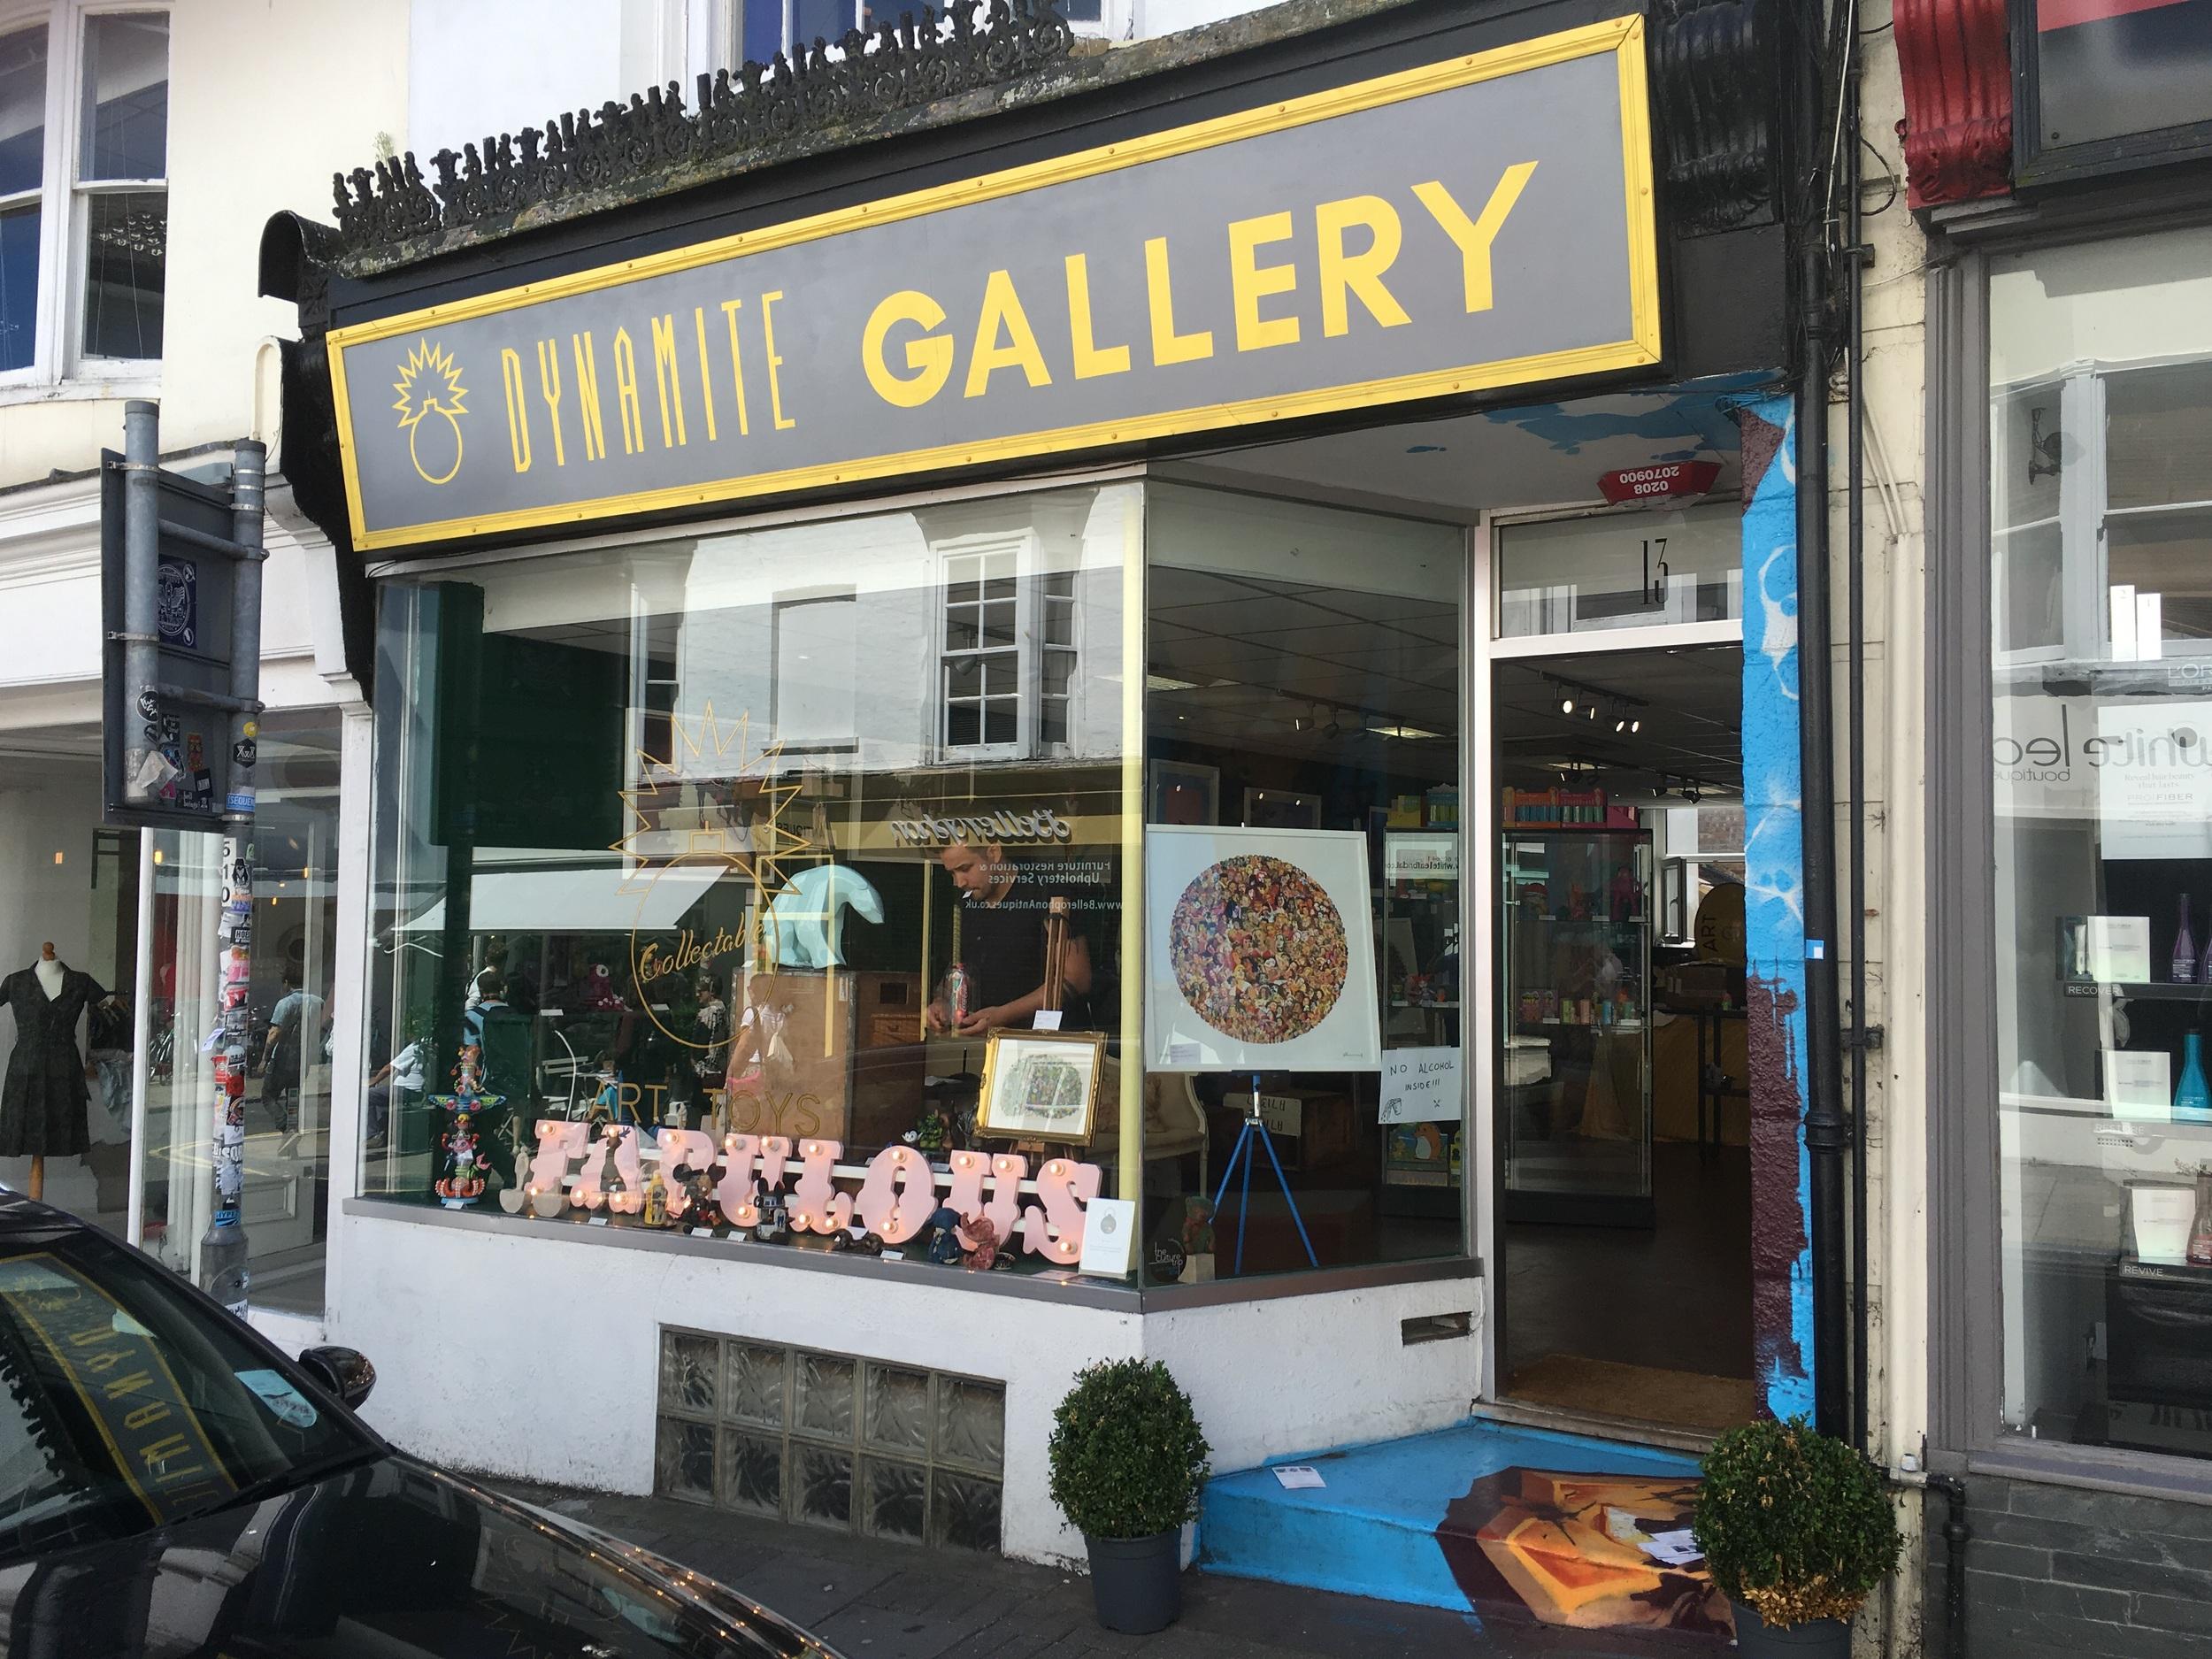 My favourite art gallery in Brighton